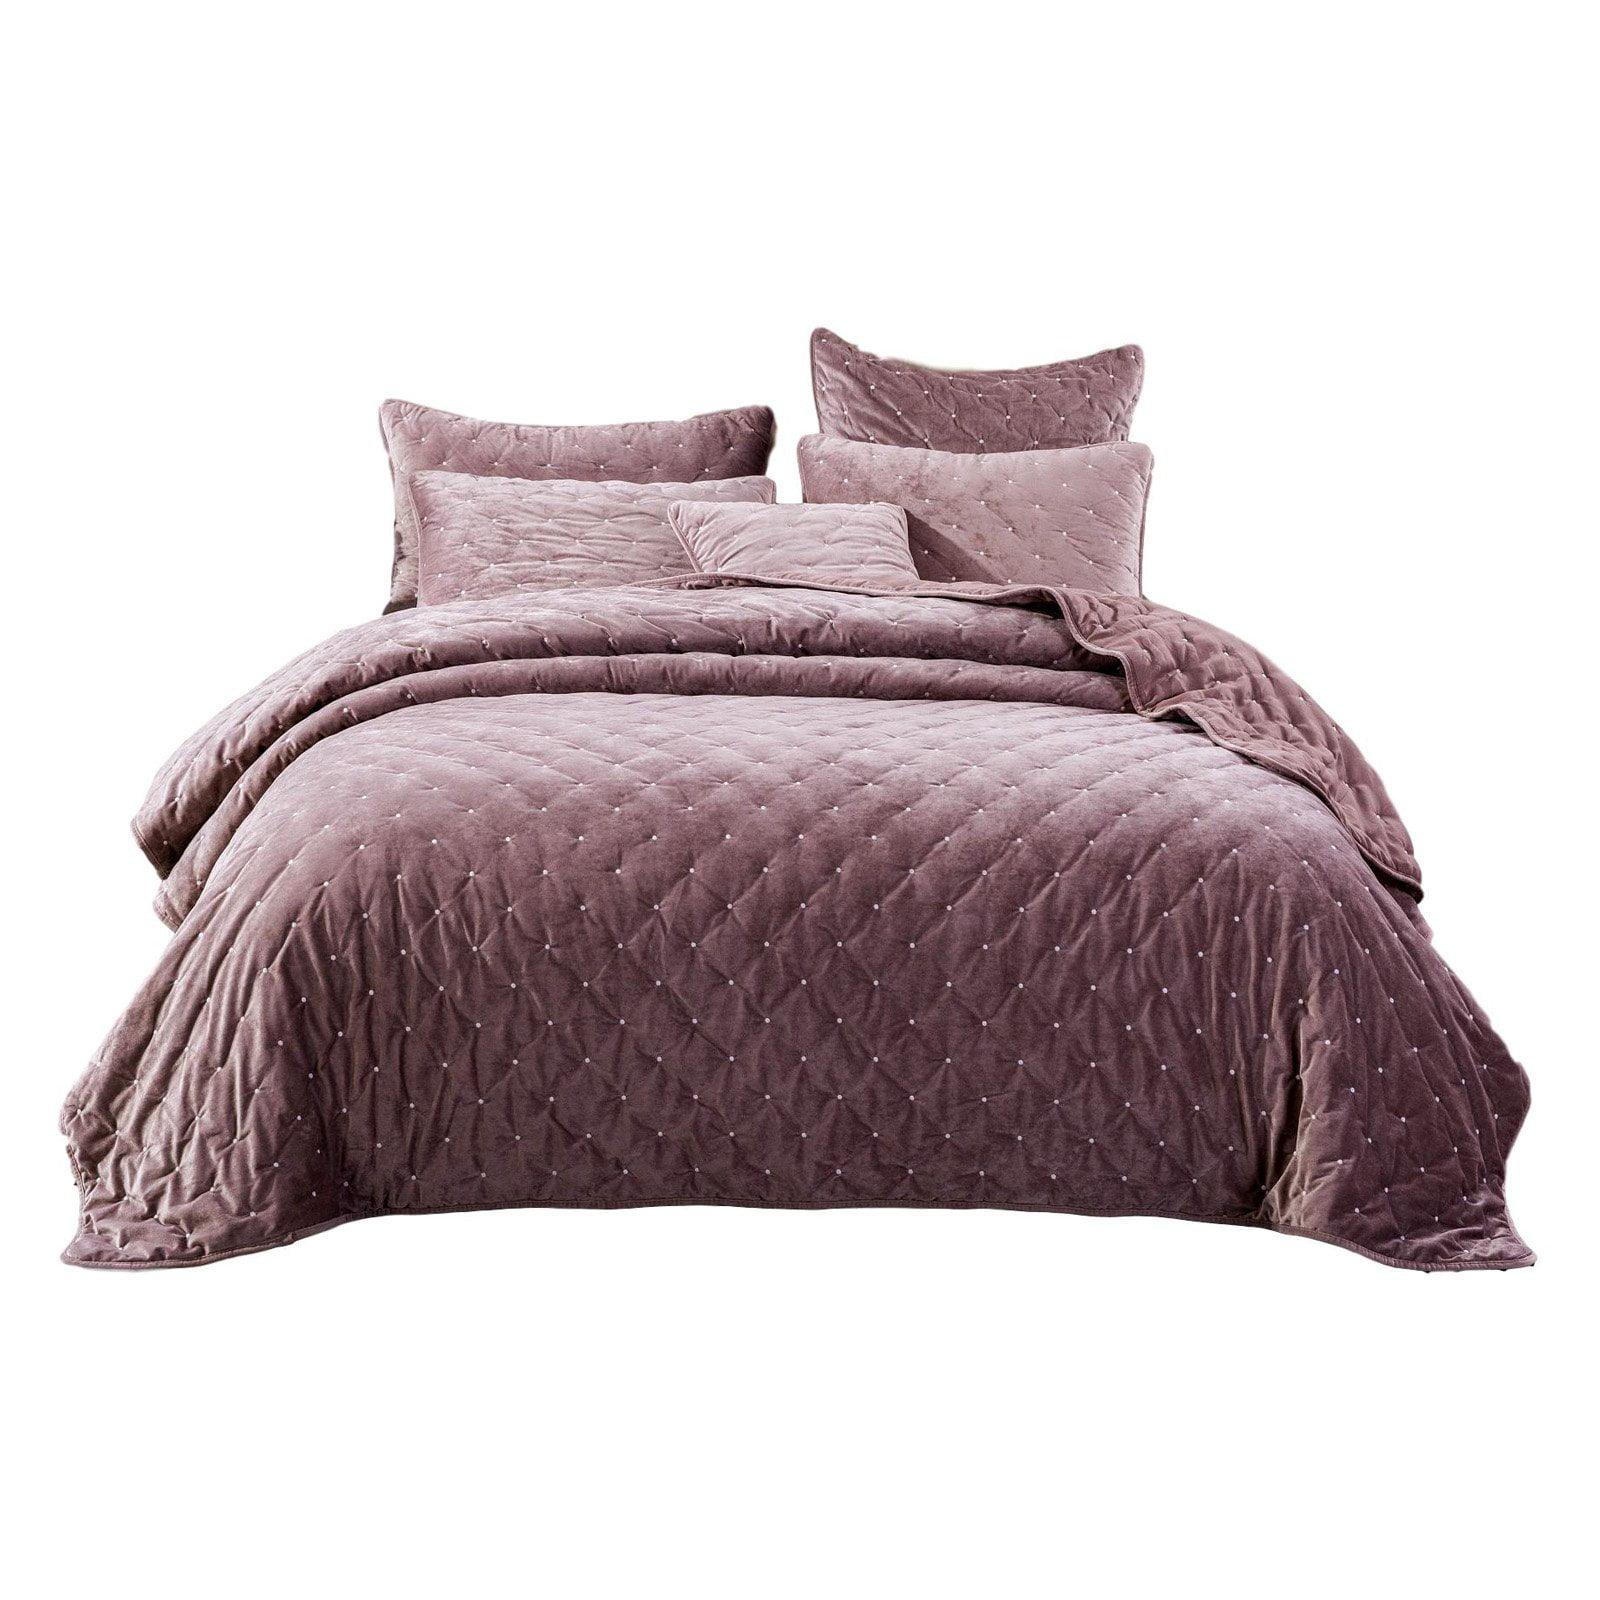 Luxury Velveteen Diamond Tufted Bedspread Set by Tache Home Fashion